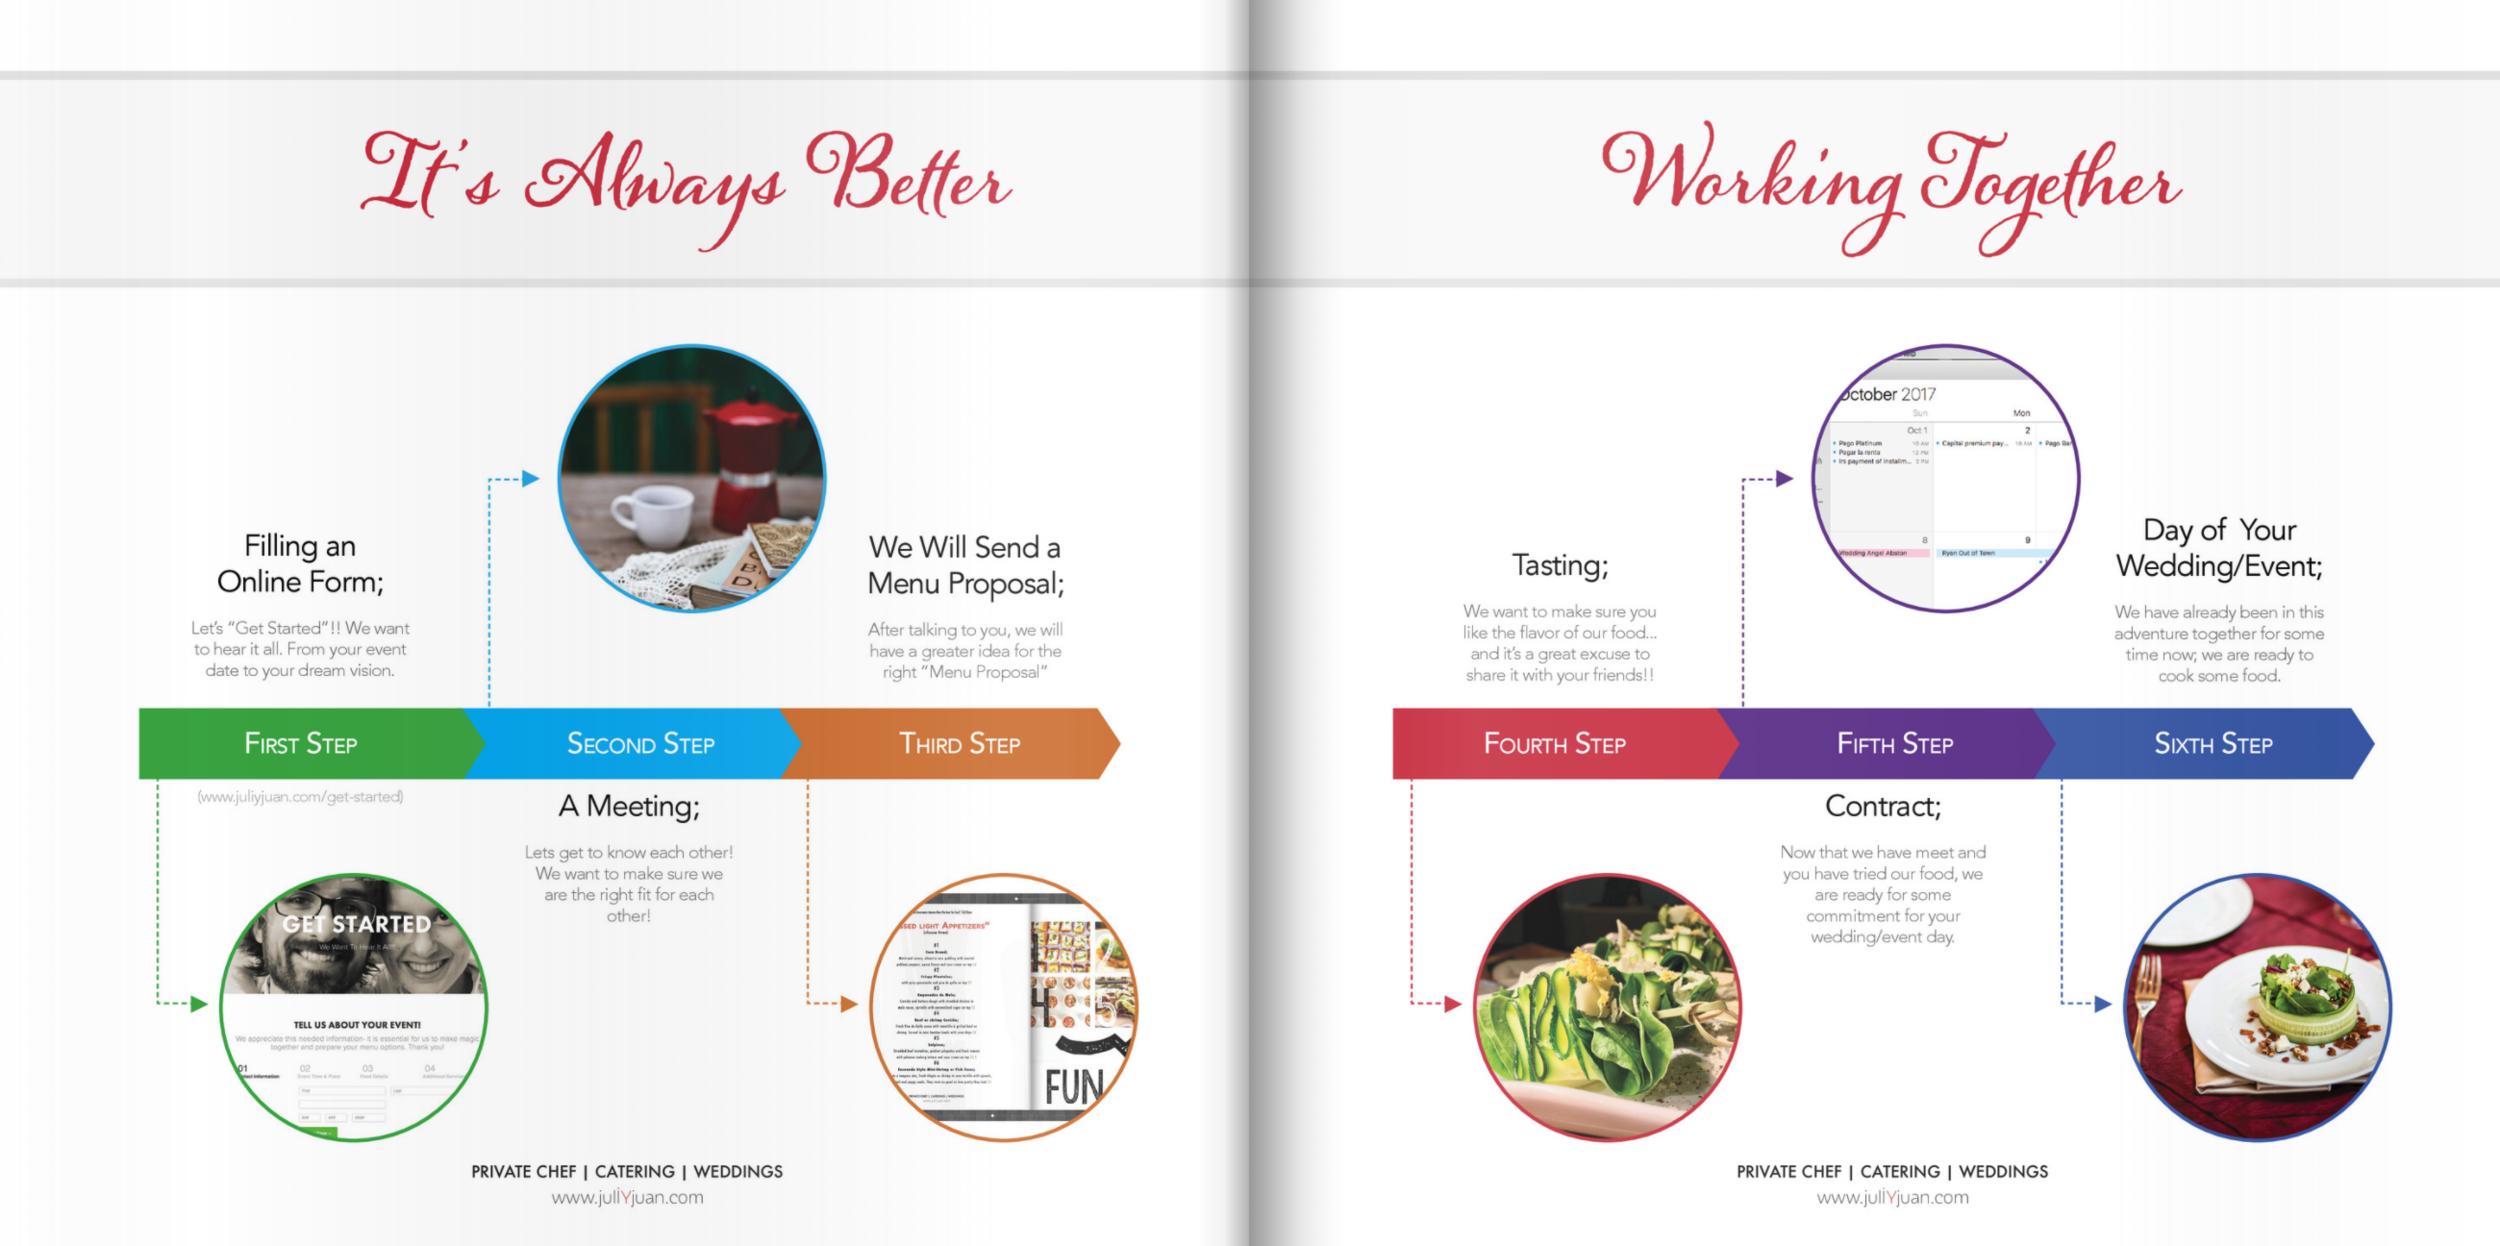 juli+juan's+kitchen+-+Process.png